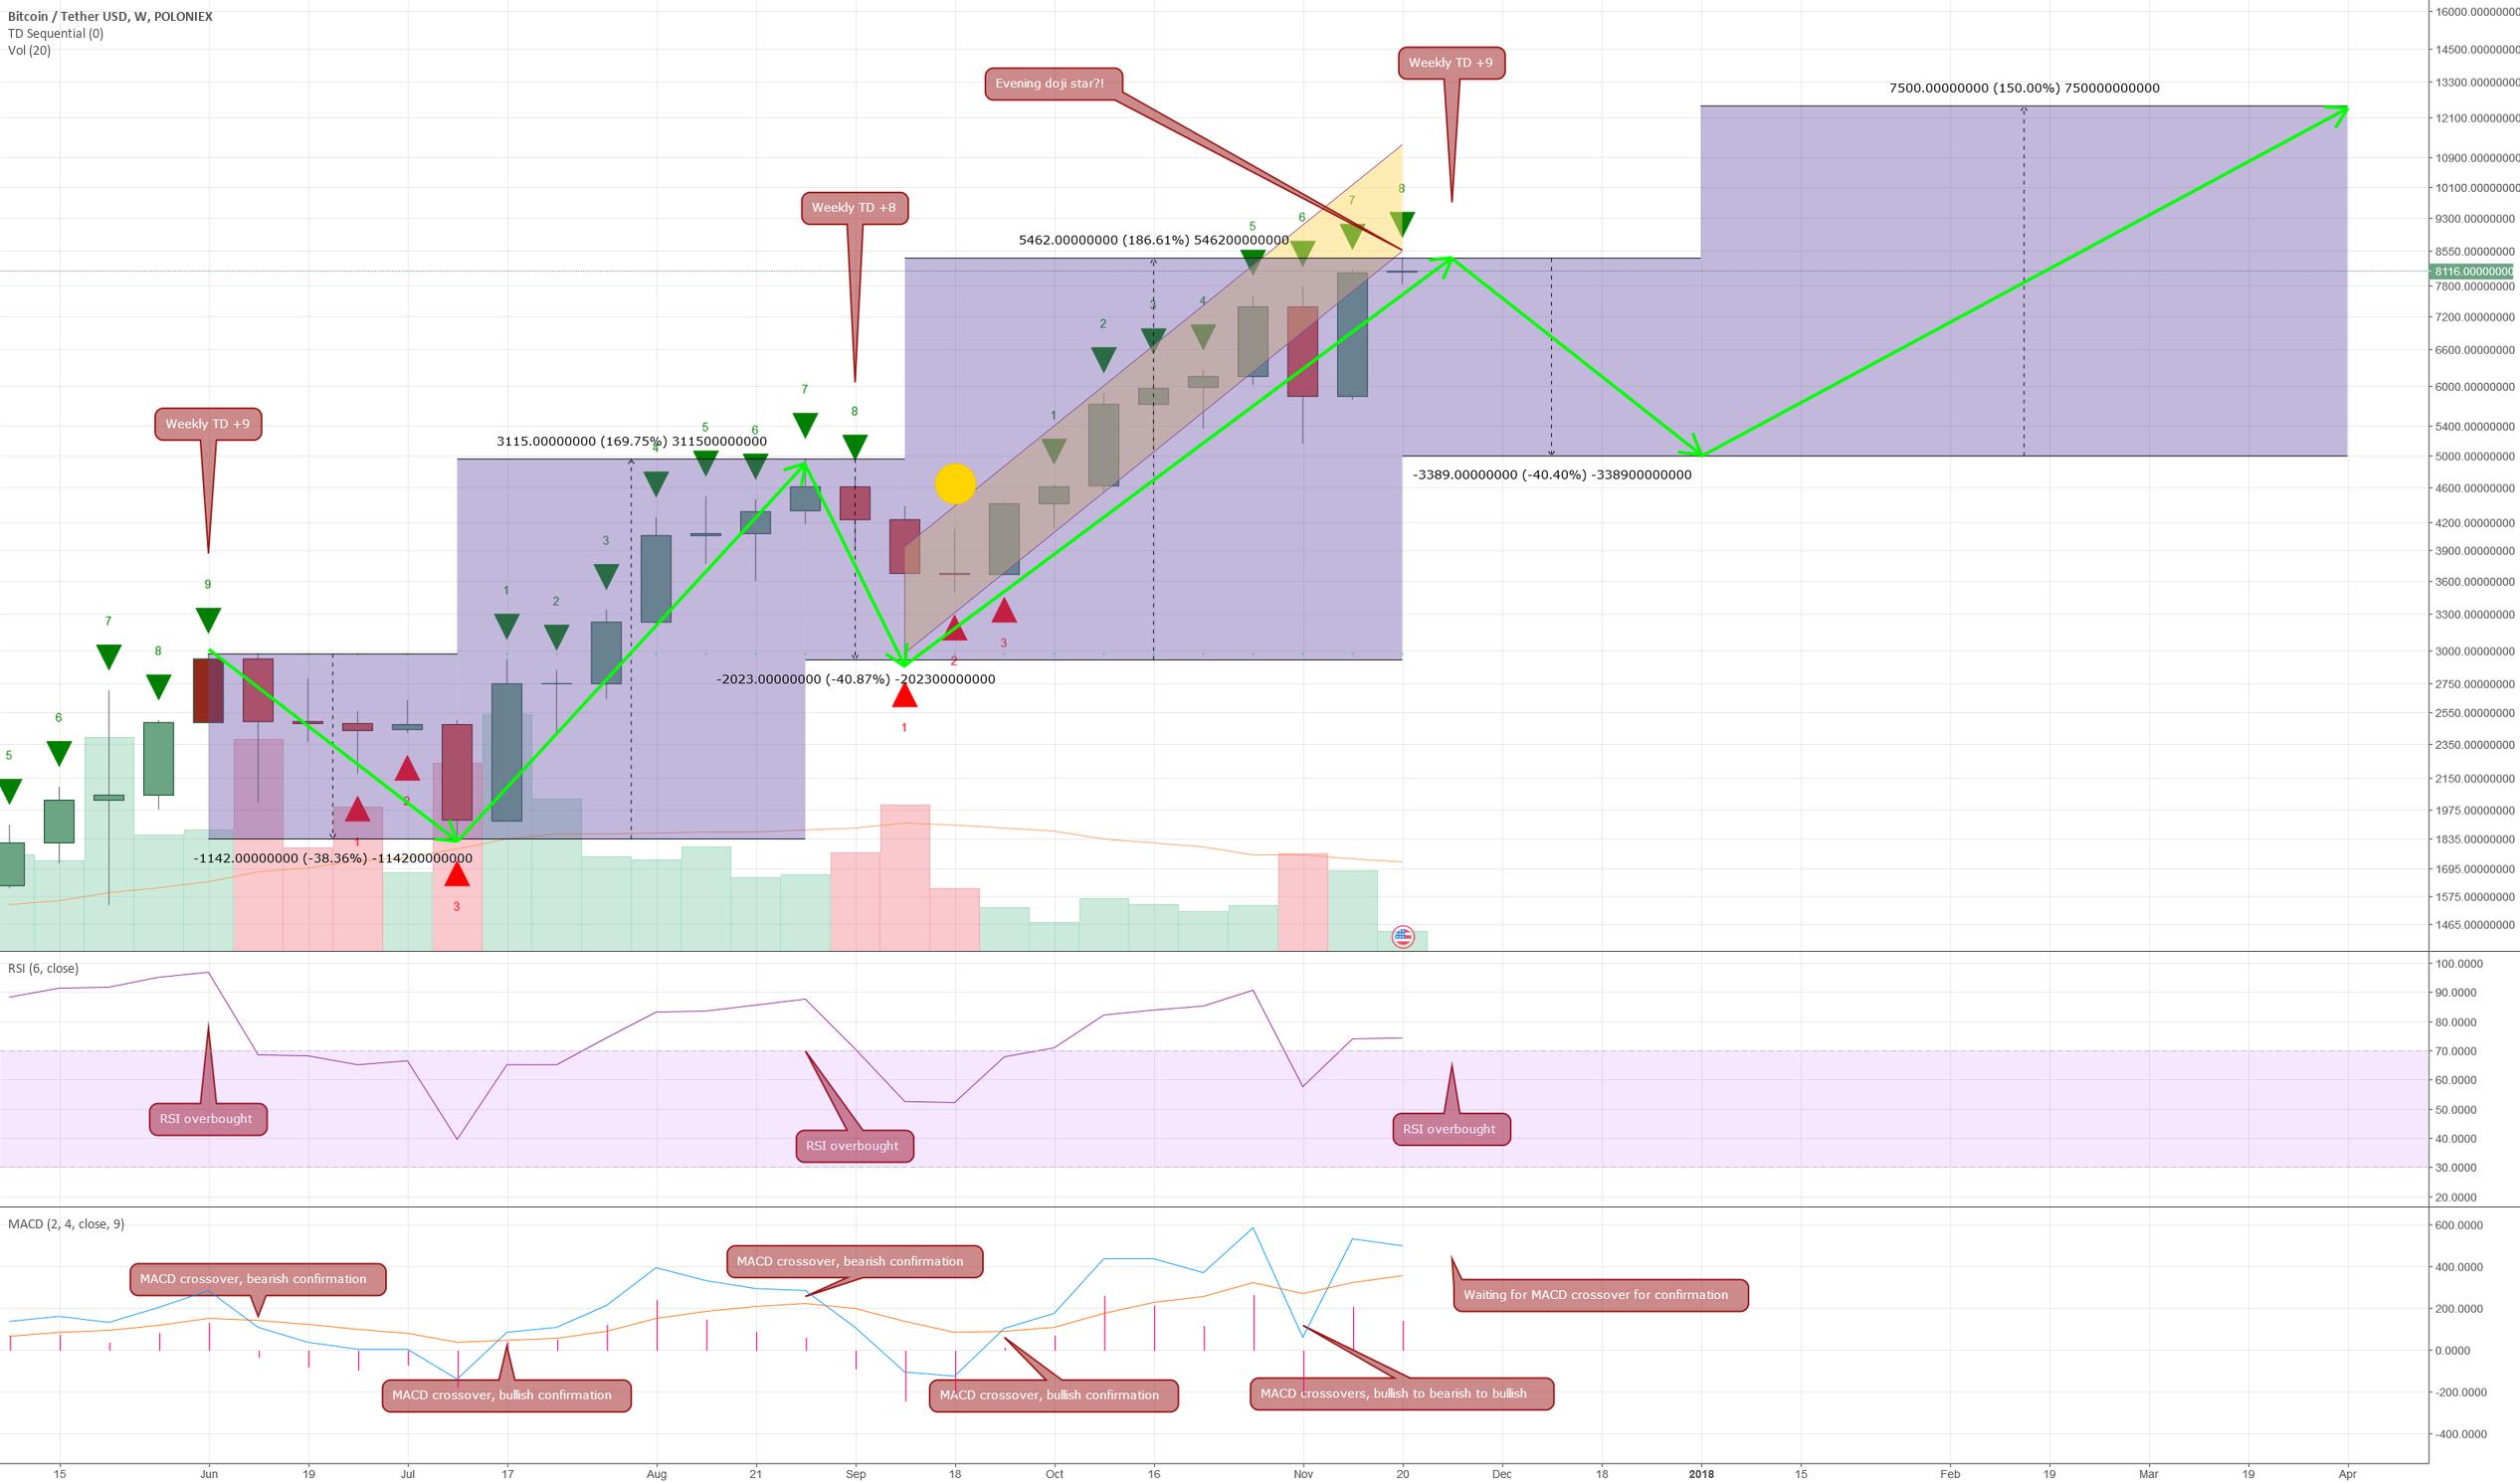 [Short] BTC bearish signals, how to hedge